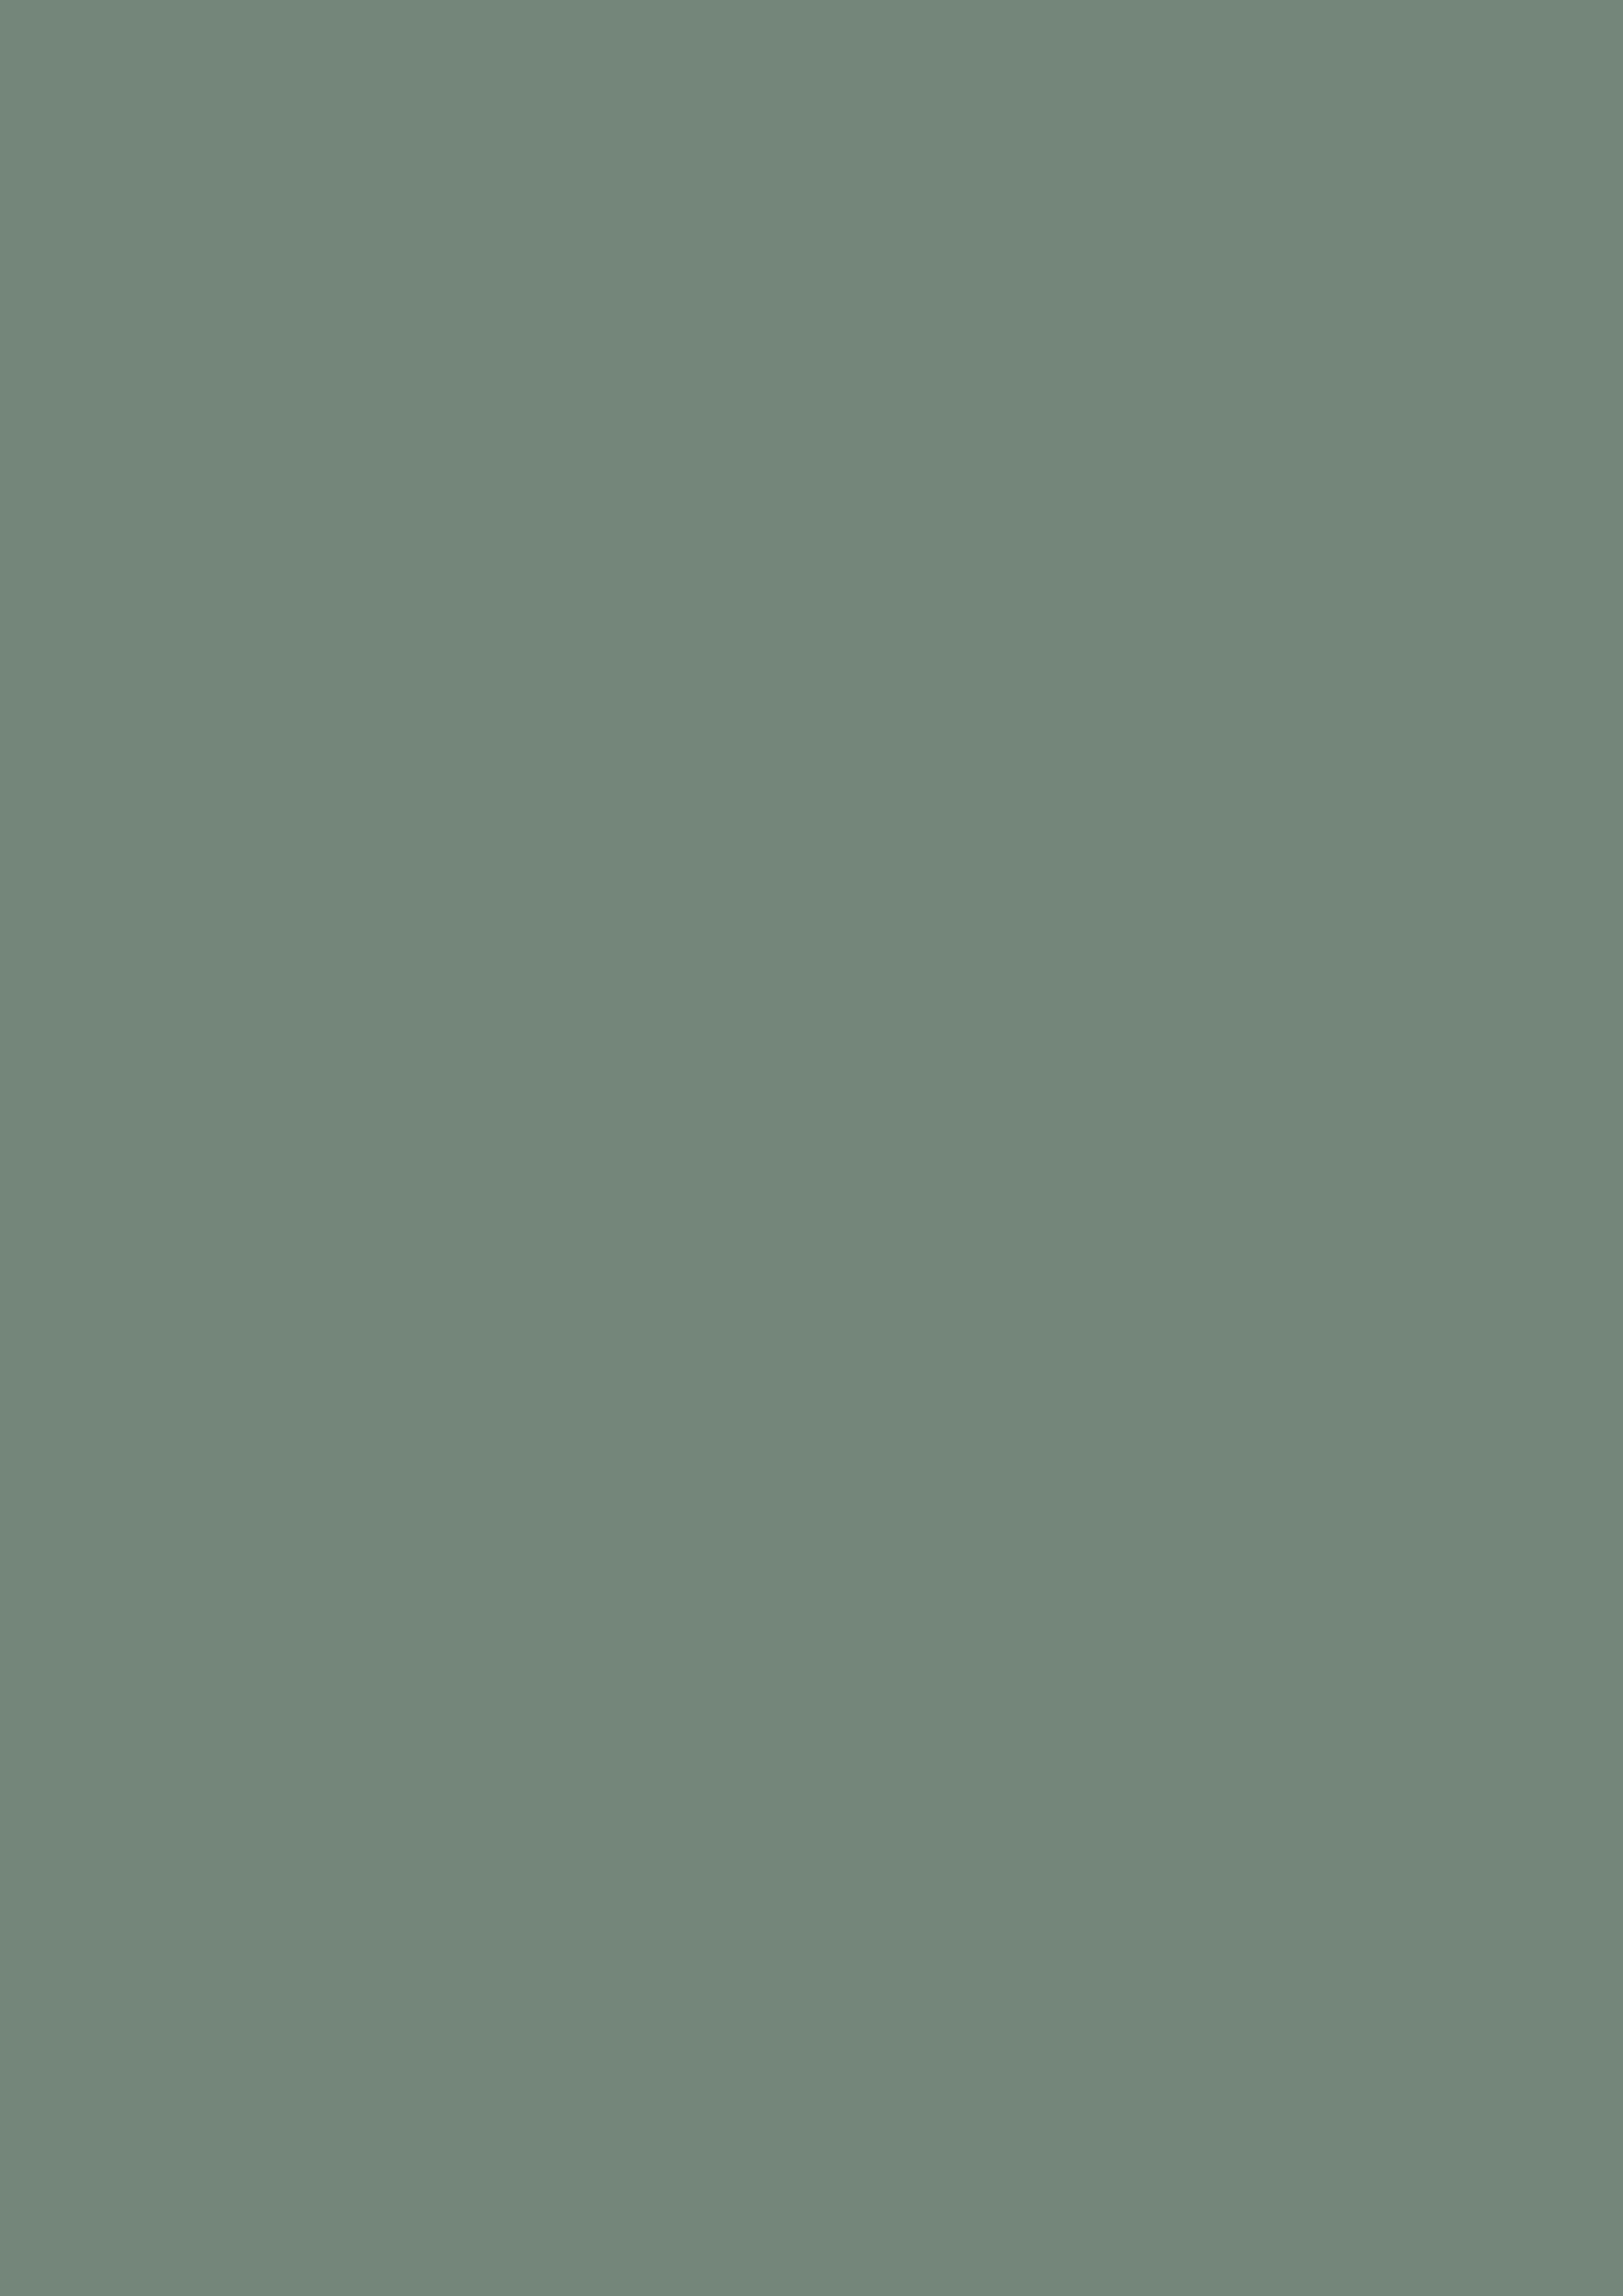 2480x3508 Xanadu Solid Color Background